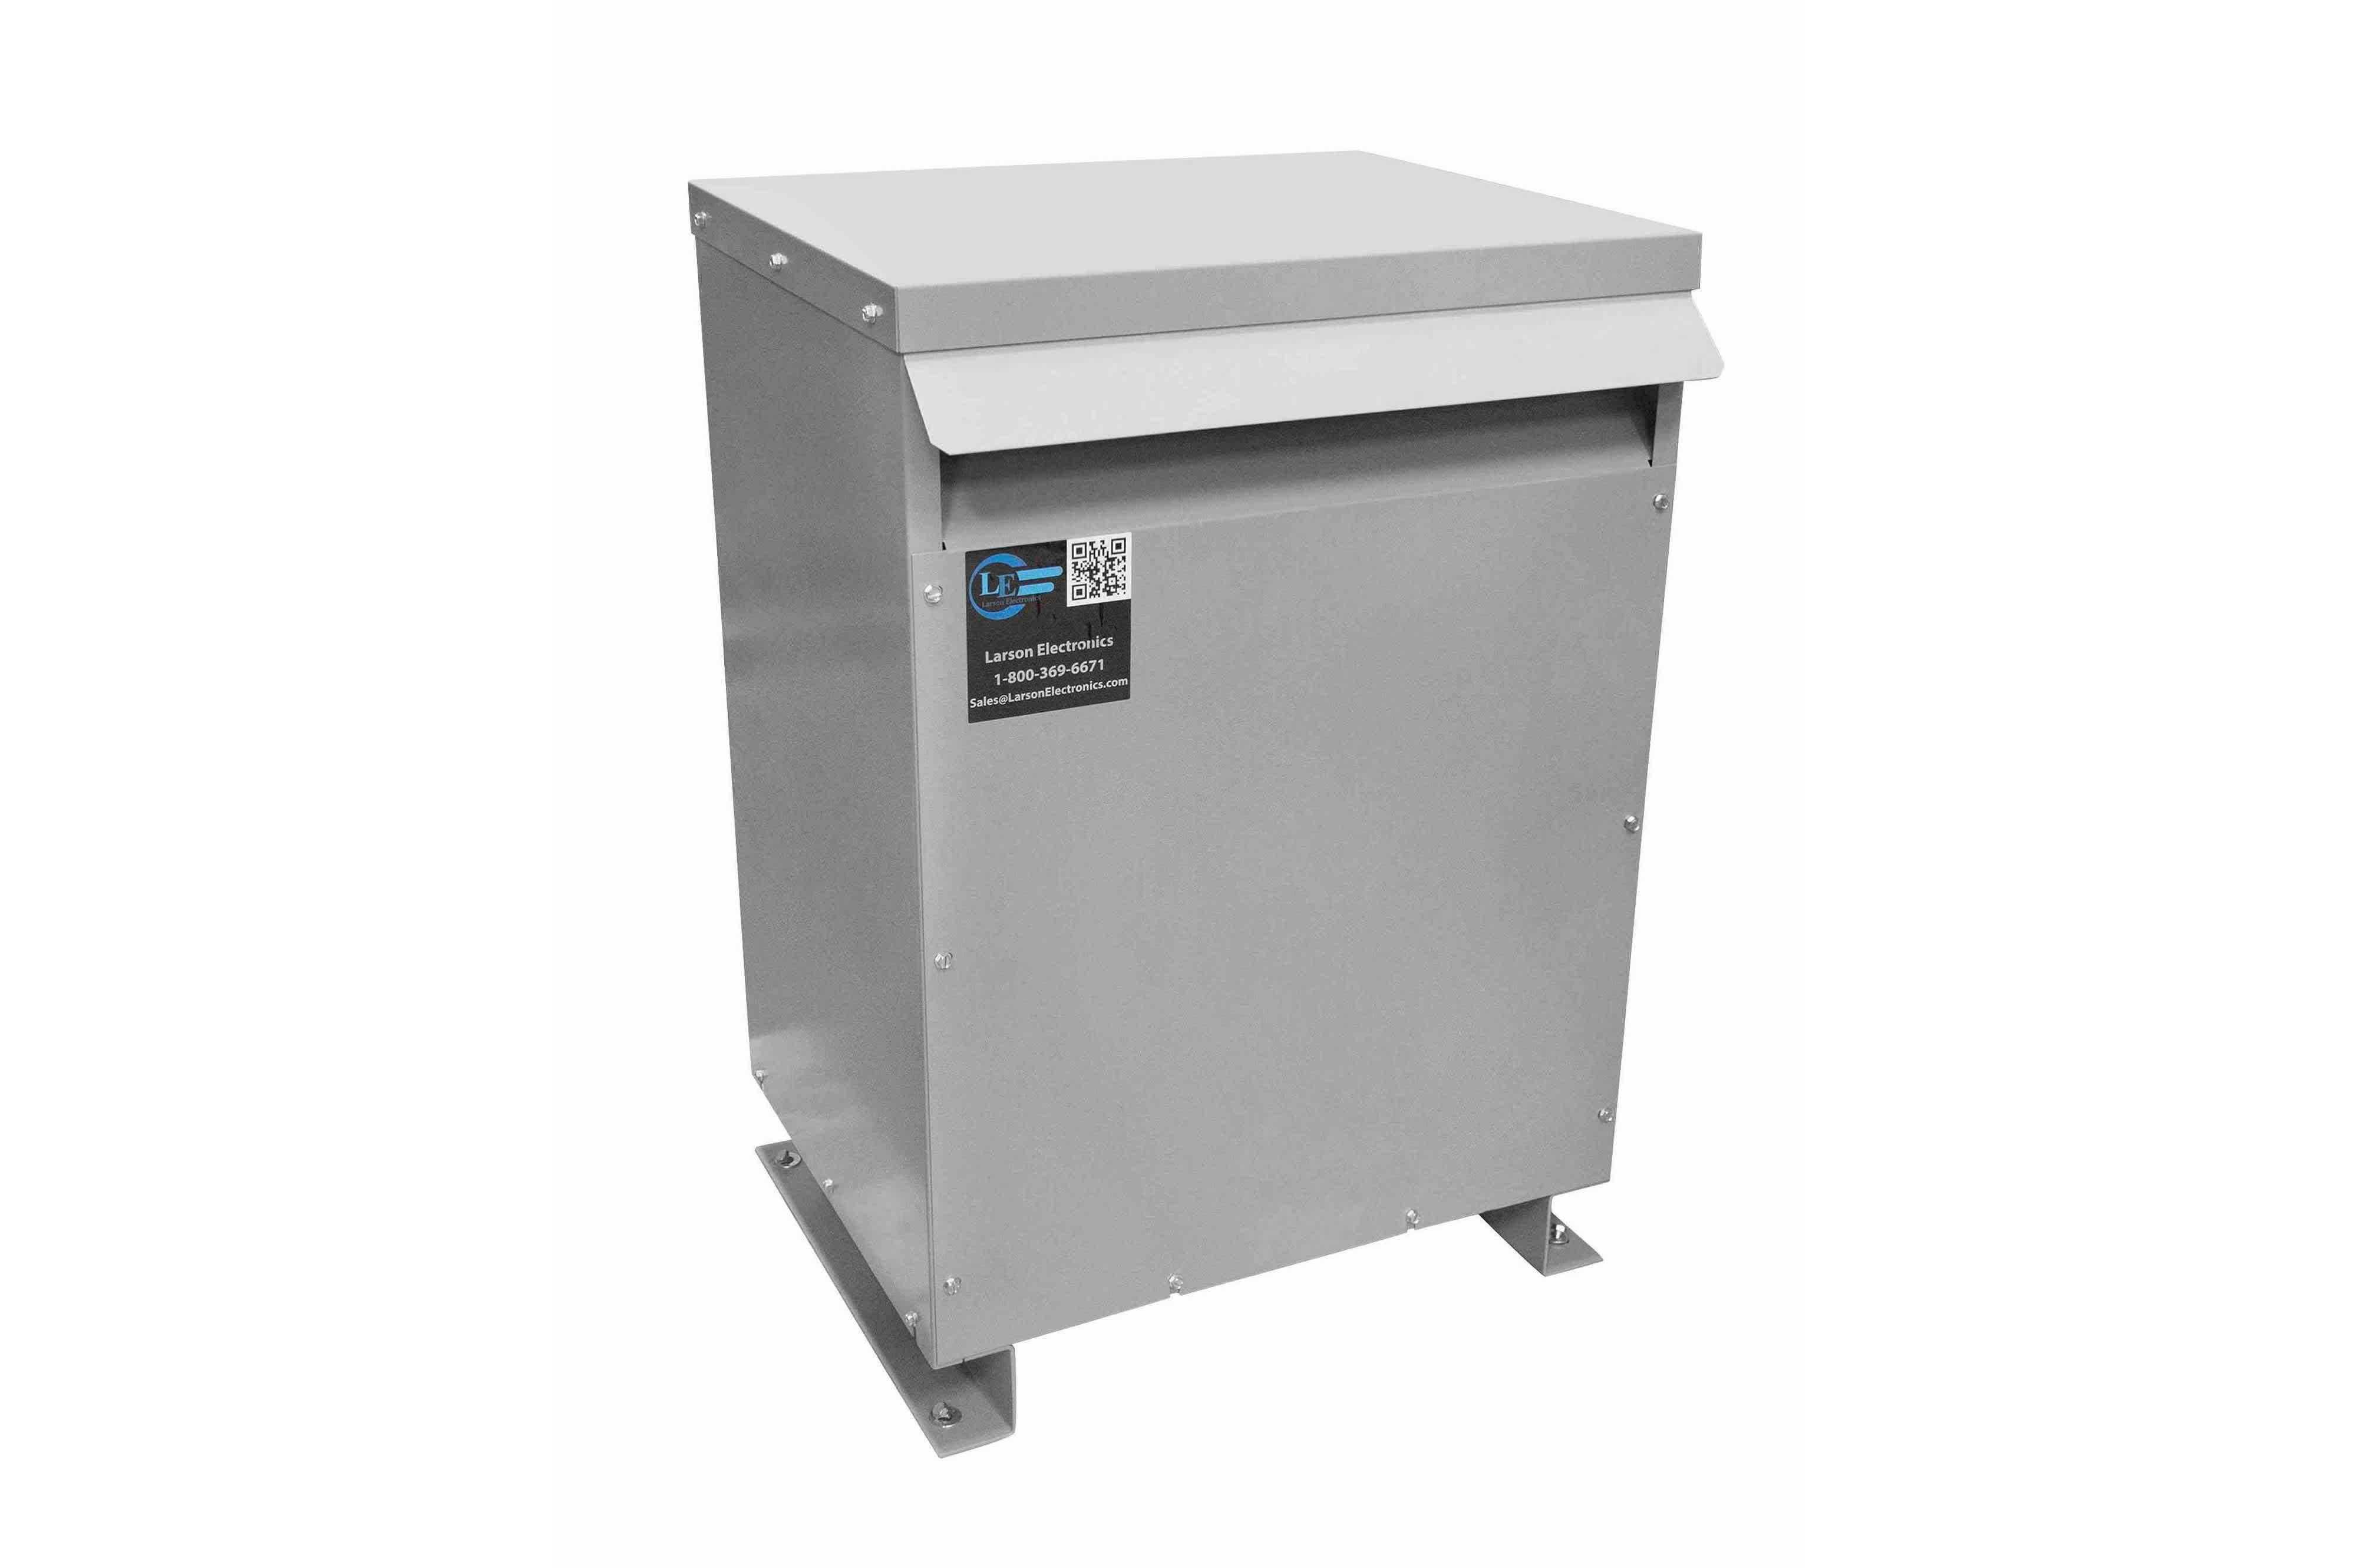 800 kVA 3PH Isolation Transformer, 220V Wye Primary, 208V Delta Secondary, N3R, Ventilated, 60 Hz